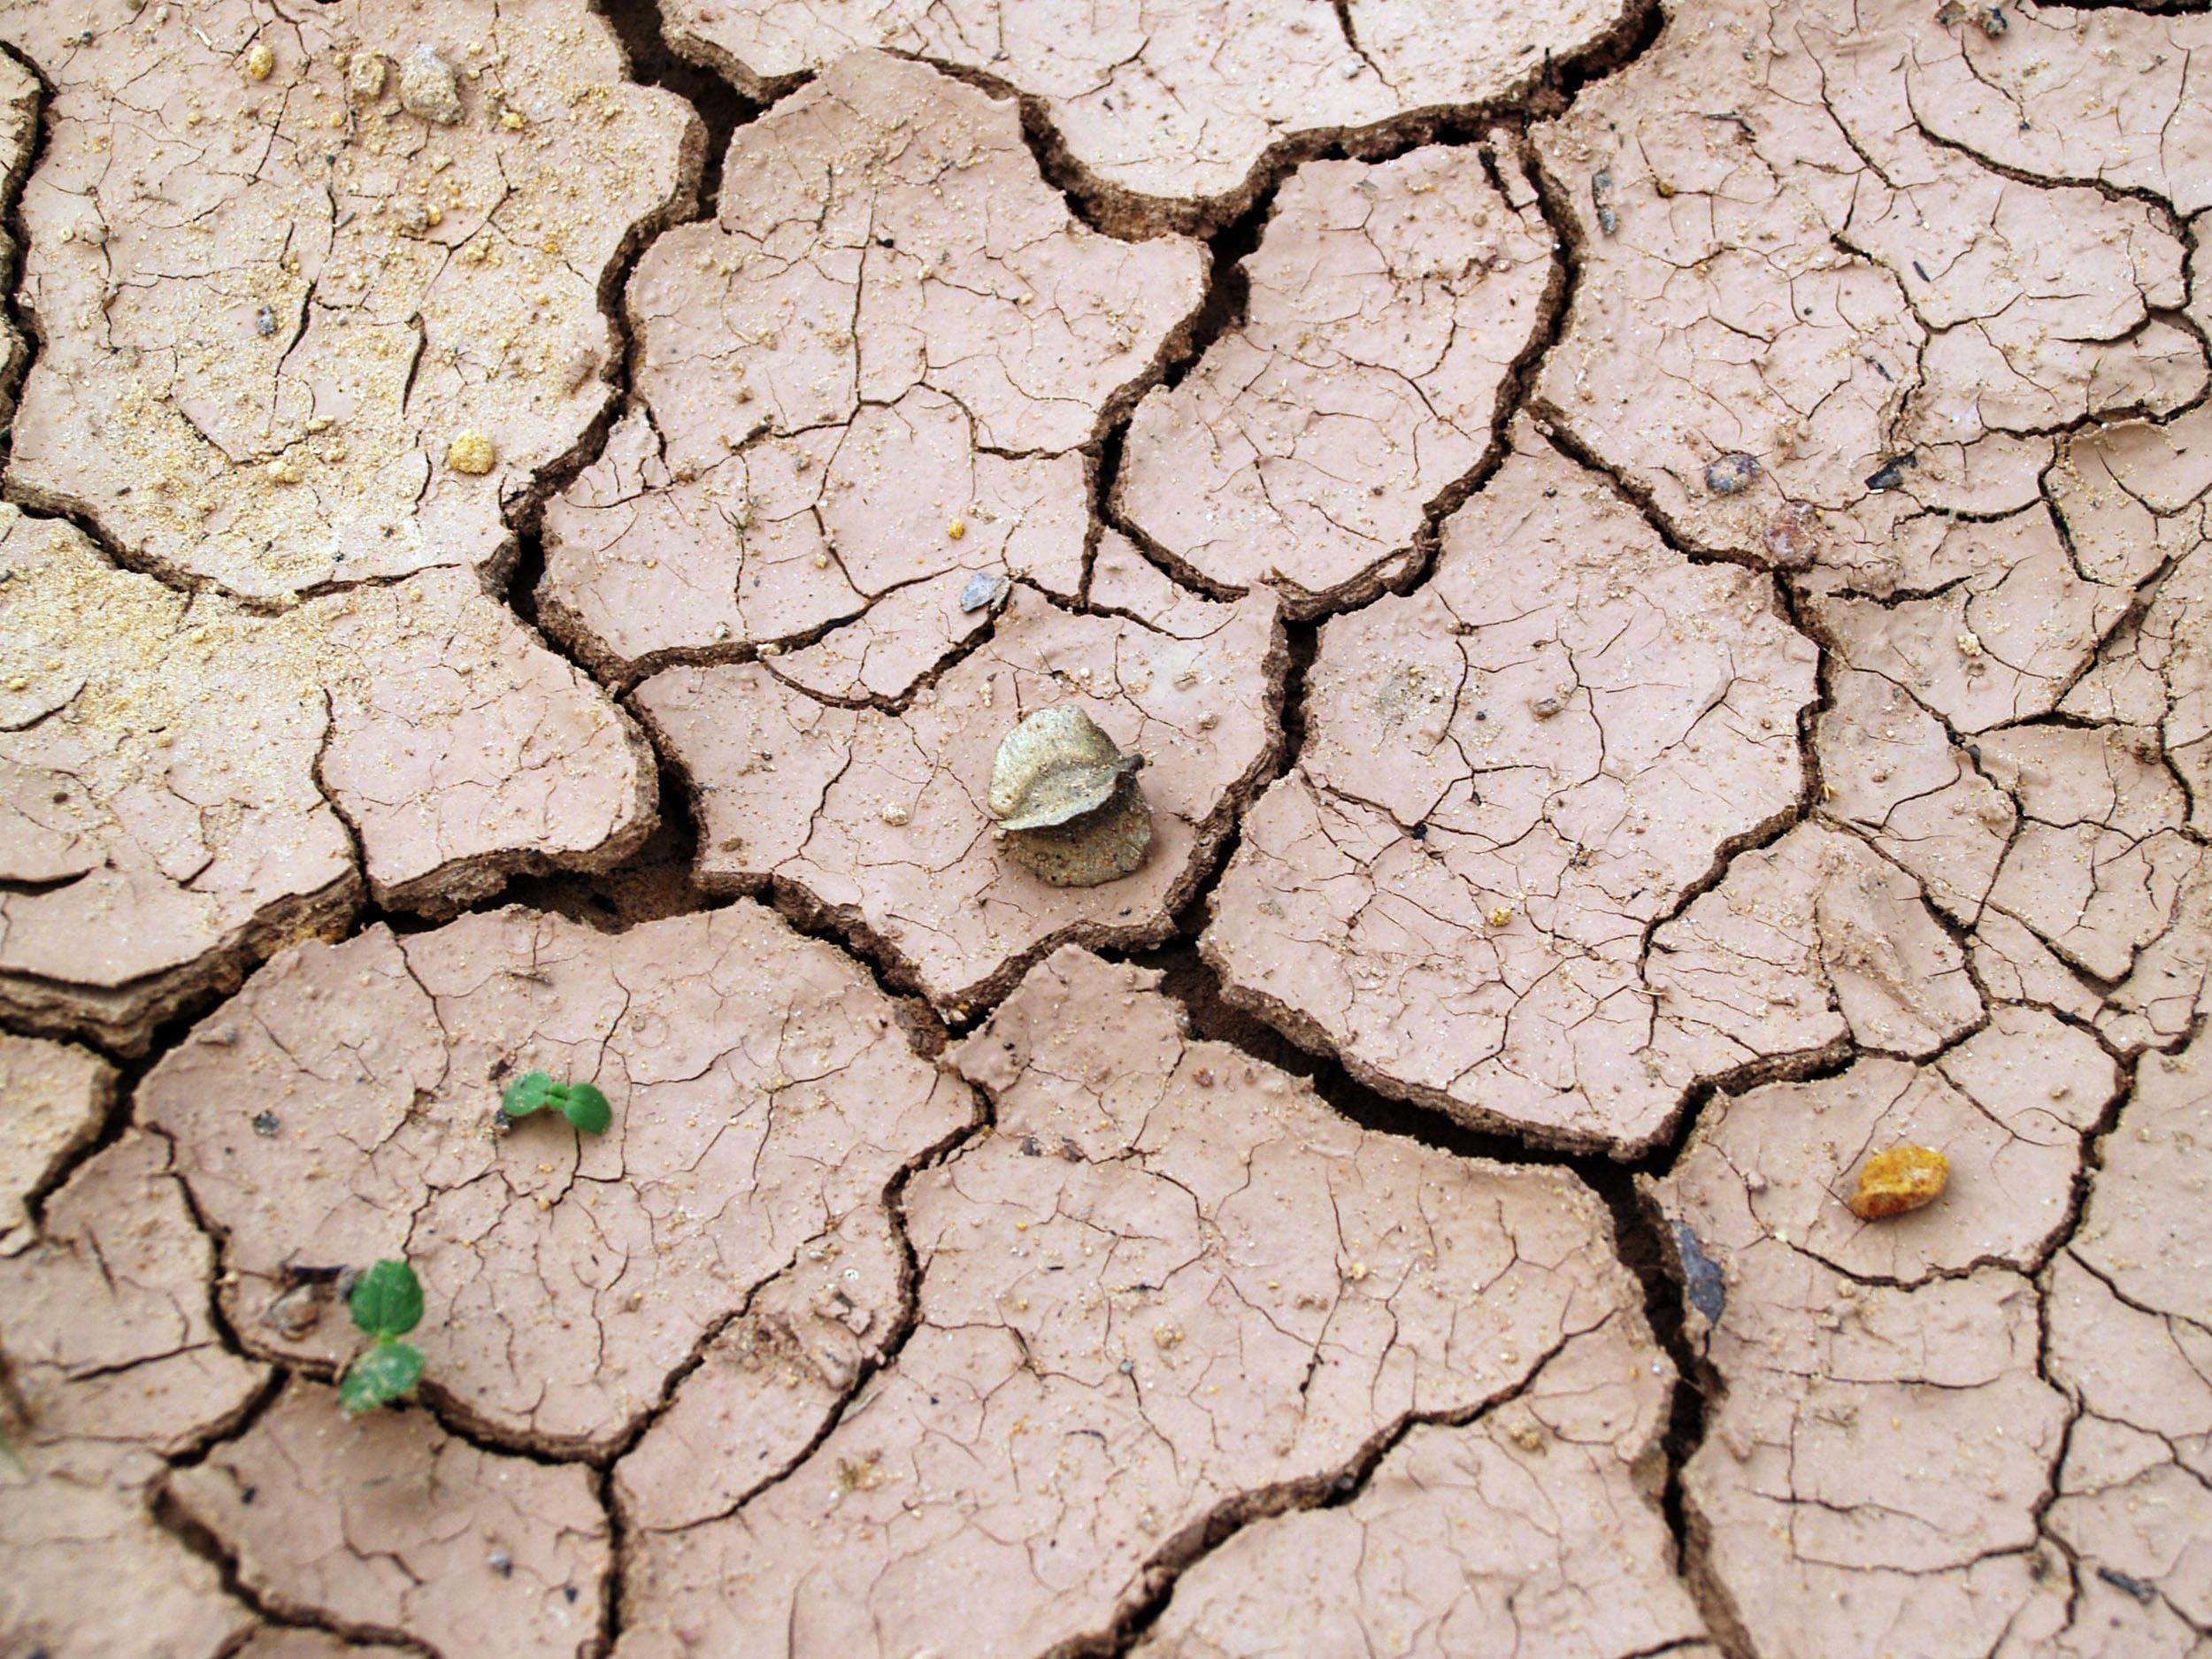 Addressing Australia's growing water problem